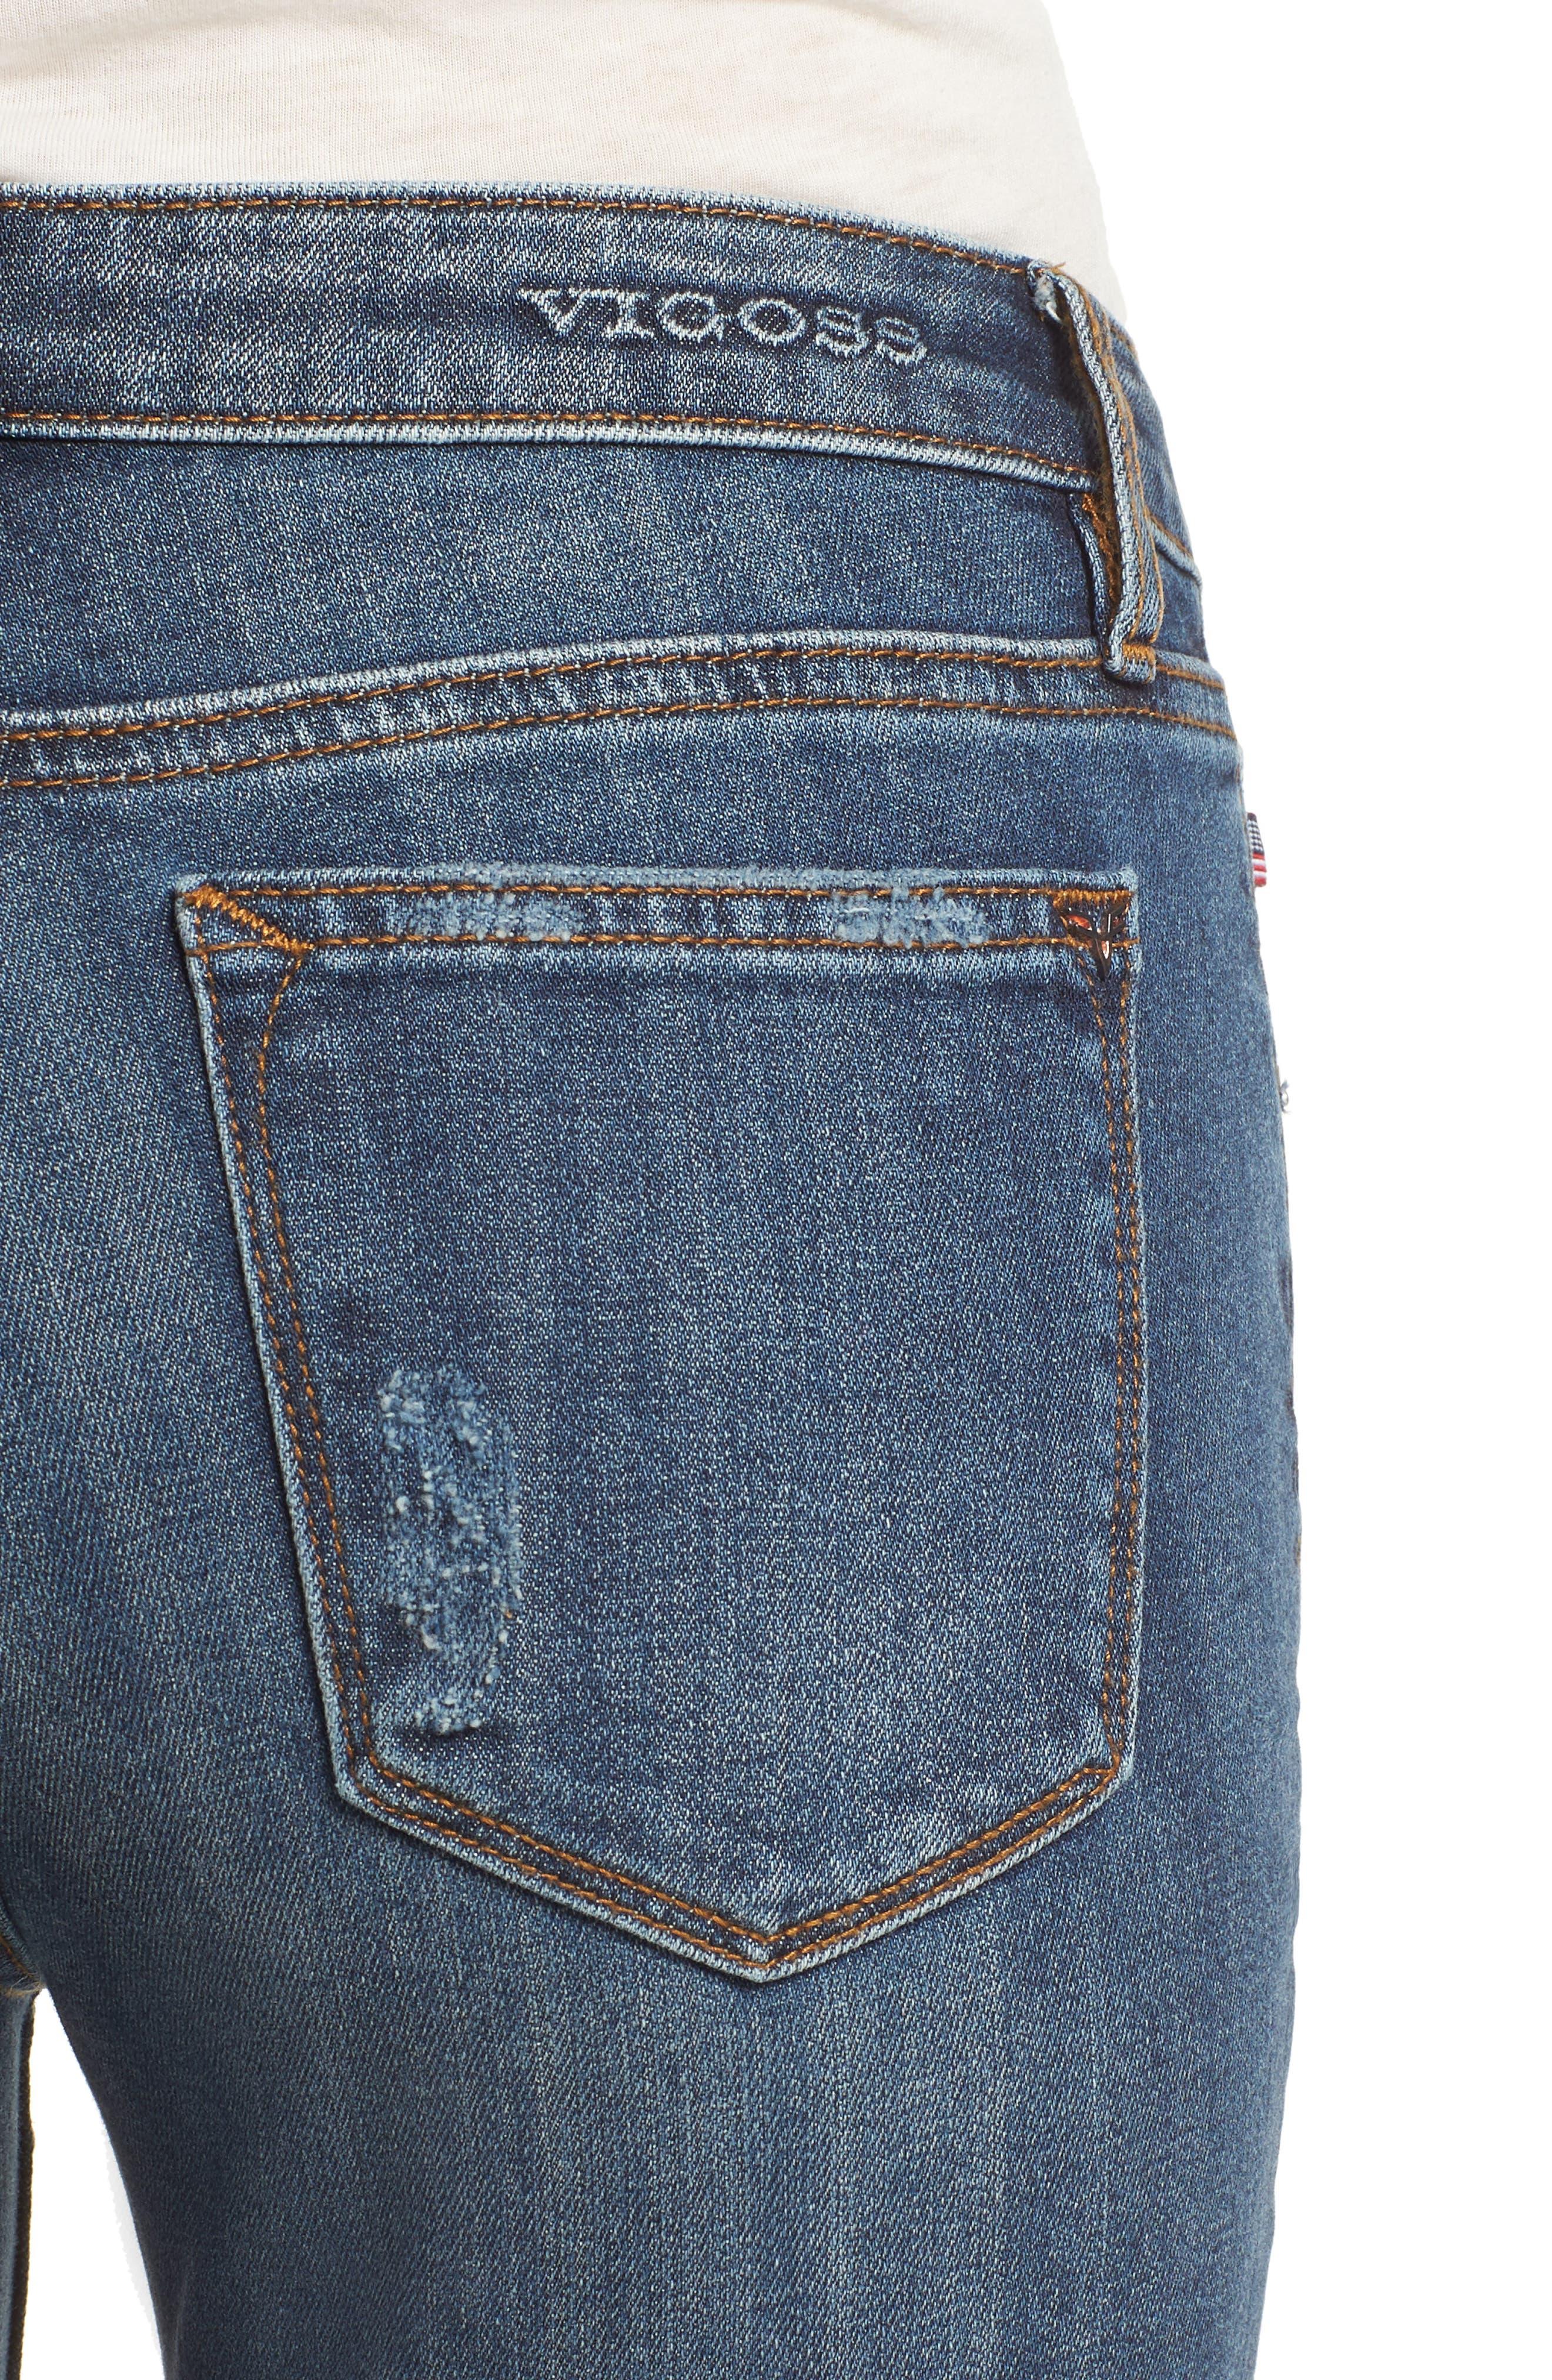 Jagger Skinny Jeans,                             Alternate thumbnail 4, color,